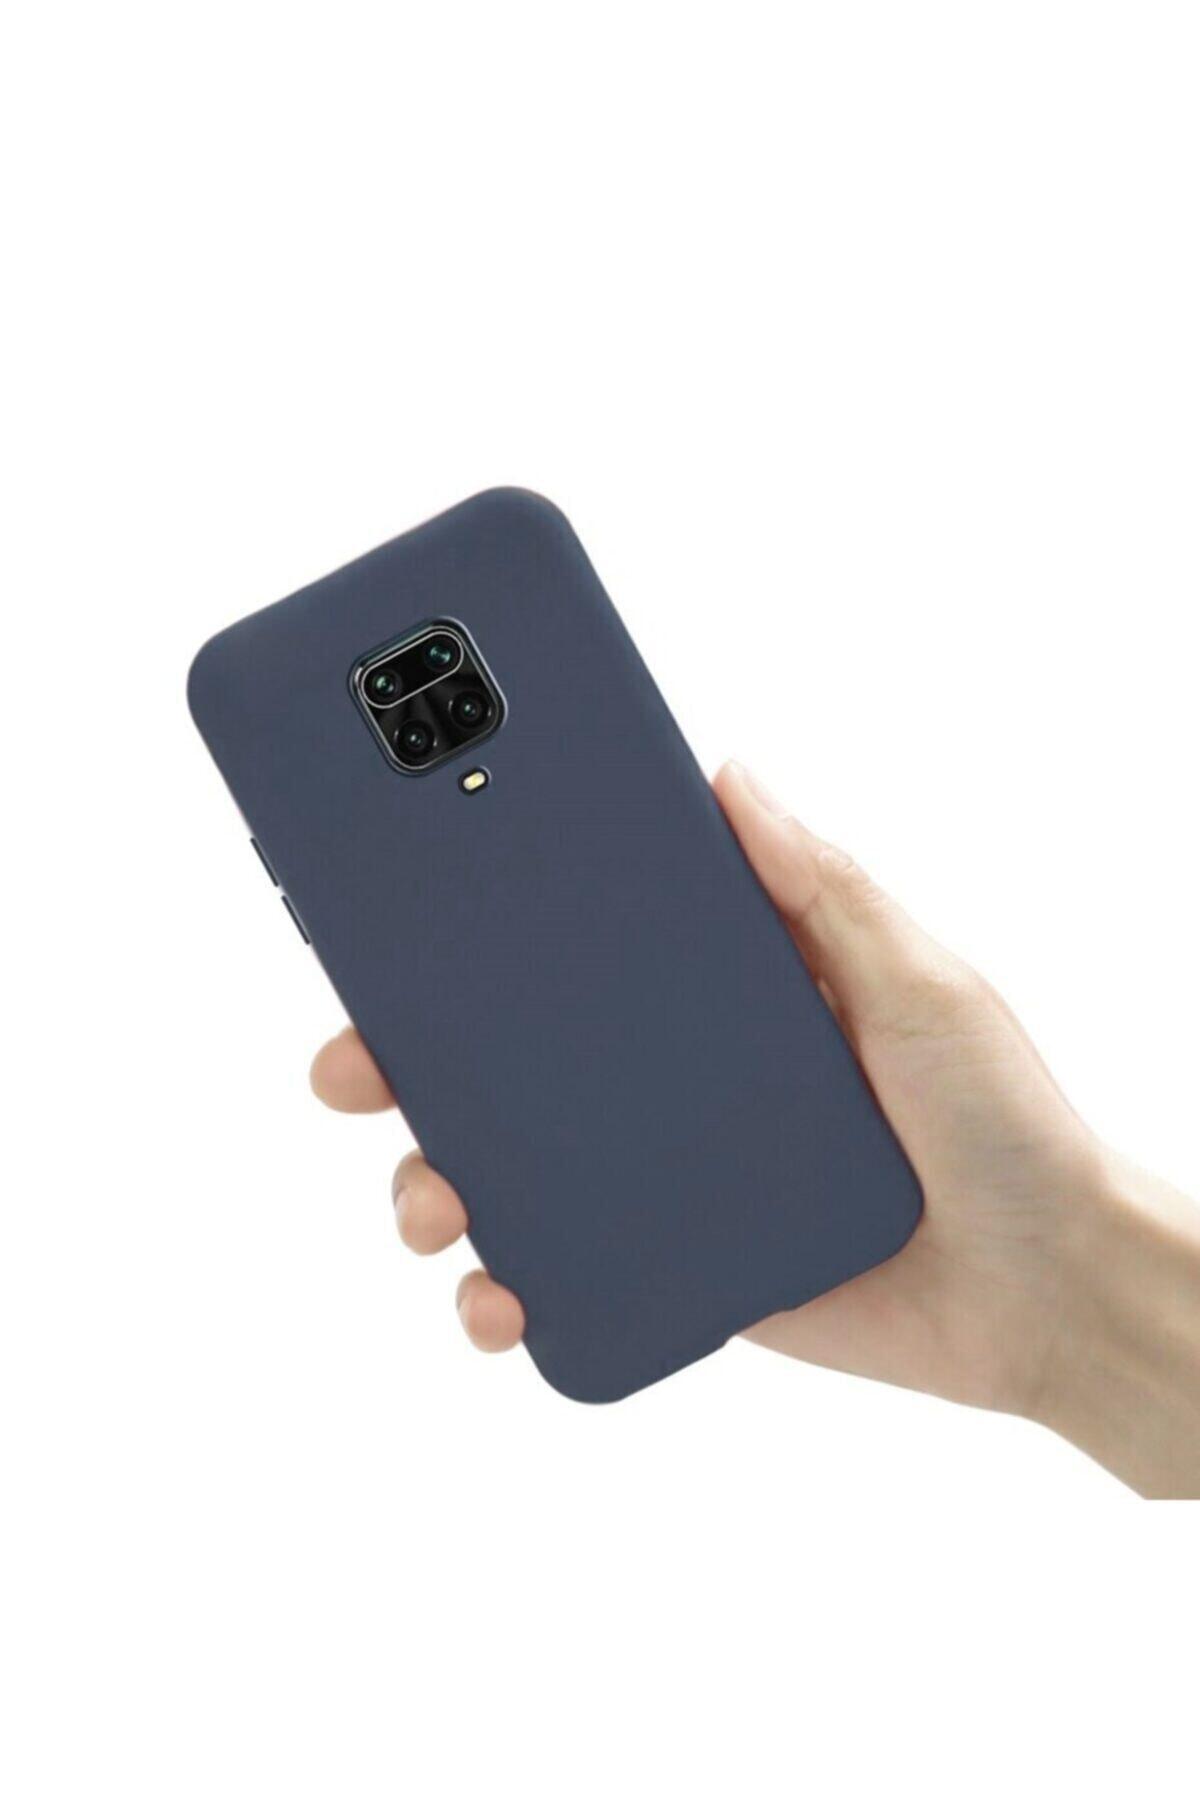 Teknoçeri Xiaomi Redmi Note 9s / Note 9 Pro Içi Kadife Lansman Silikon Kılıf 2